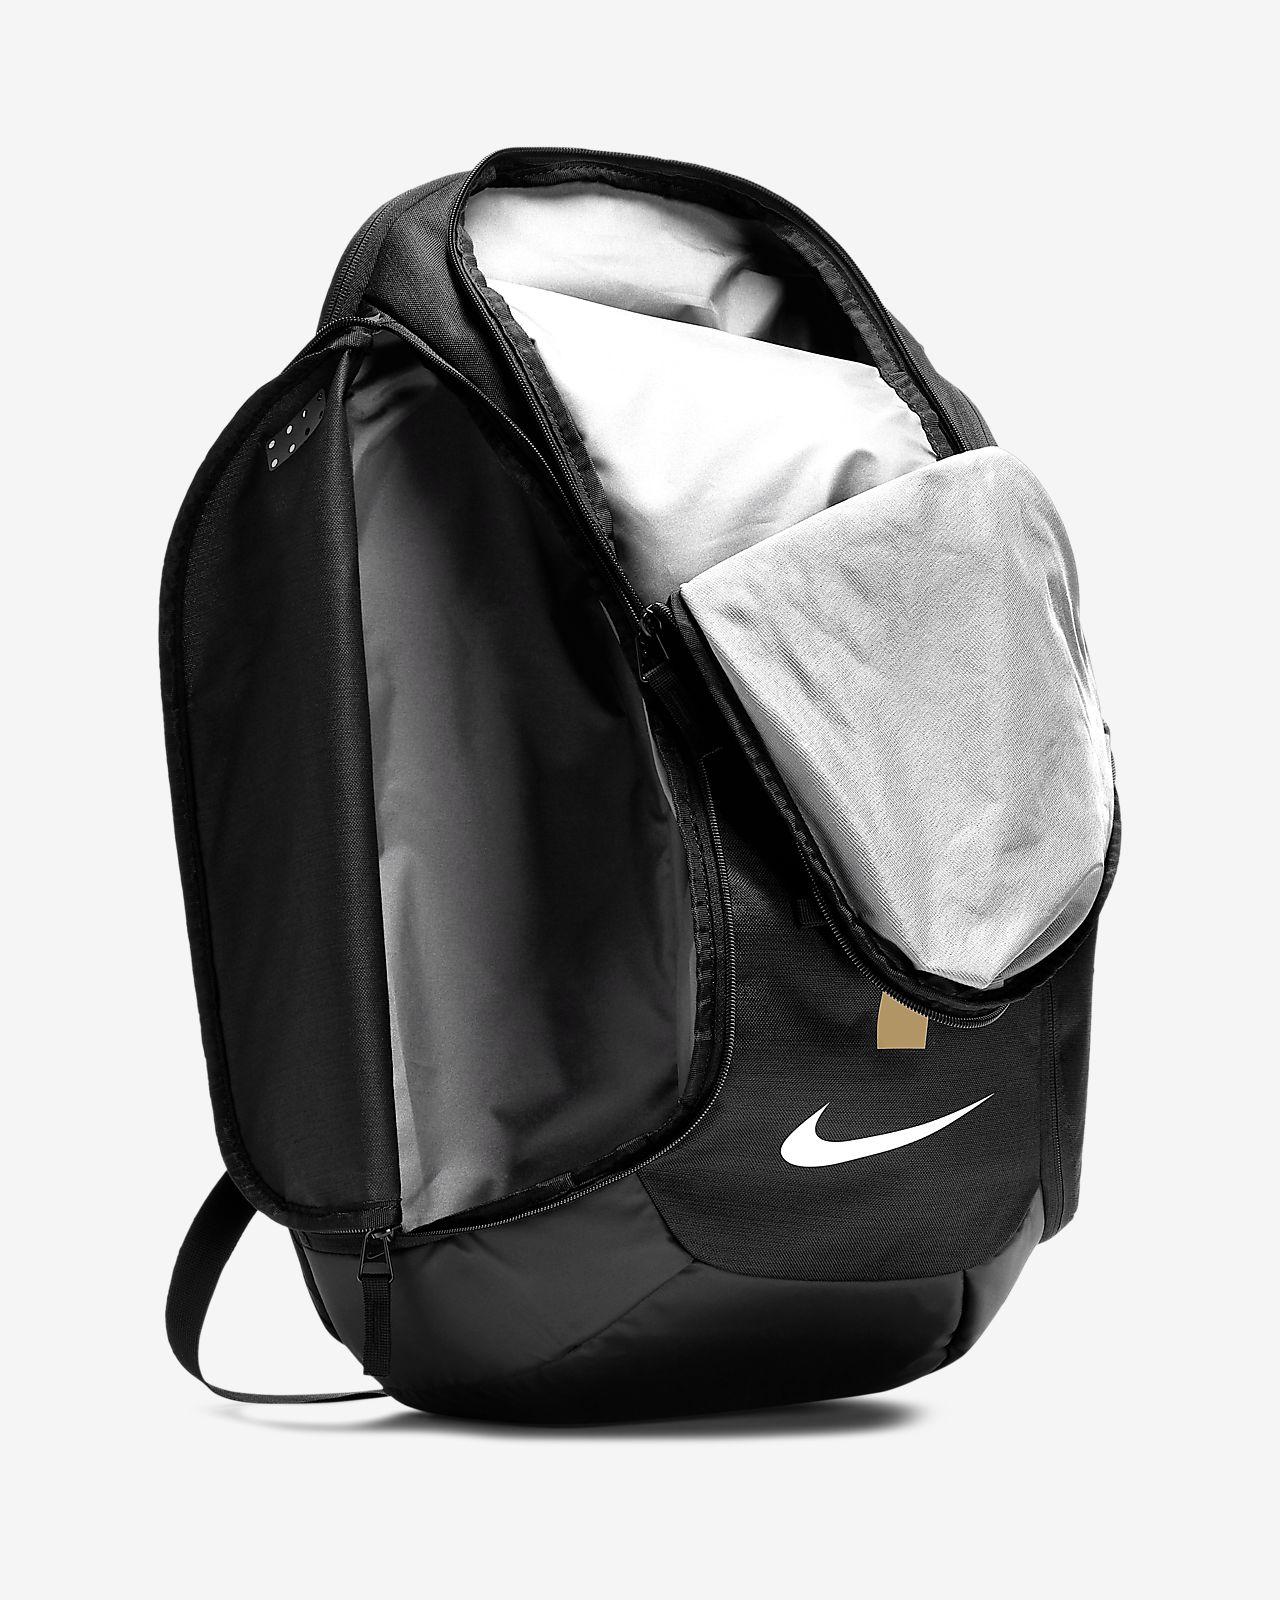 Nike Hoops Elite Max Air Team 2.0 Backpack, GreyBlackGold